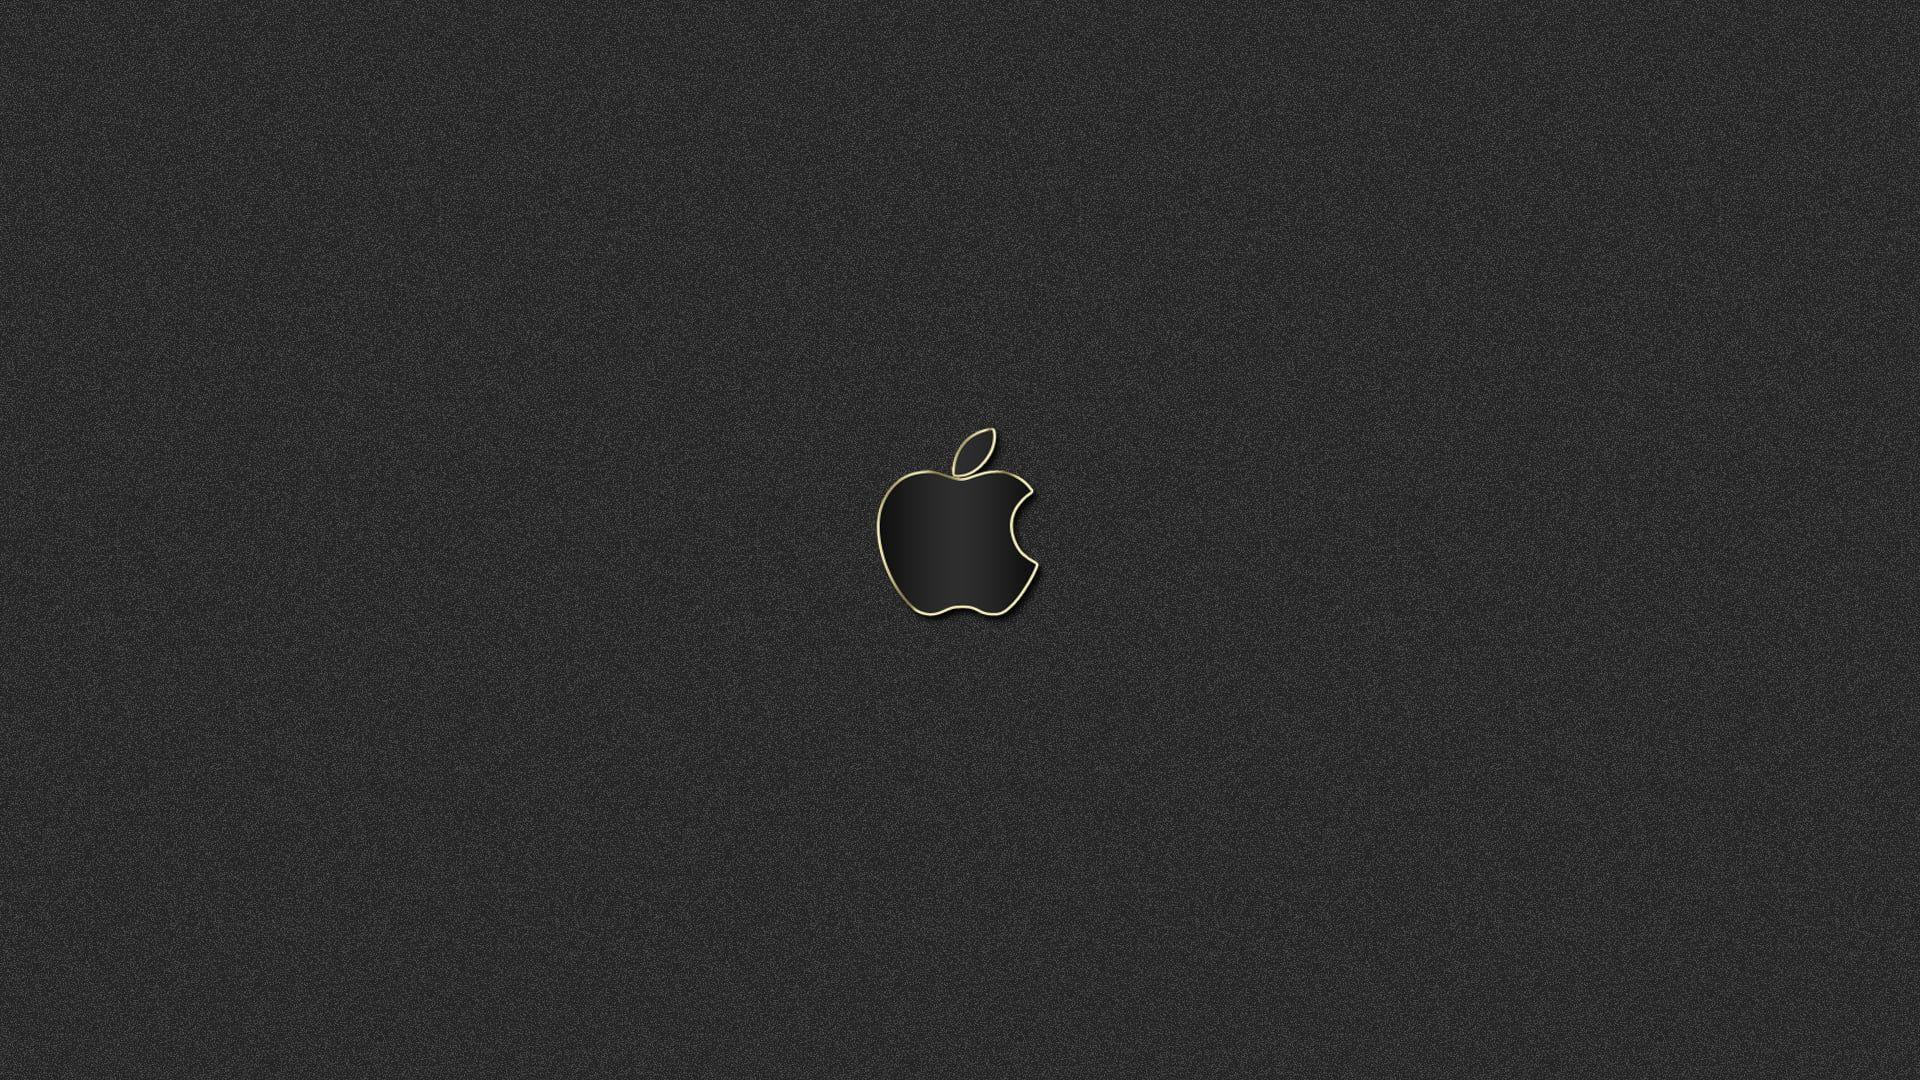 Apple Logo Gold Black Apple Logo Mac 1080p Wallpaper Hdwallpaper Desktop In 2021 Apple Logo Live Wallpaper Iphone Apple Logo Wallpaper Apple logo apple wallpaper hd 1080p